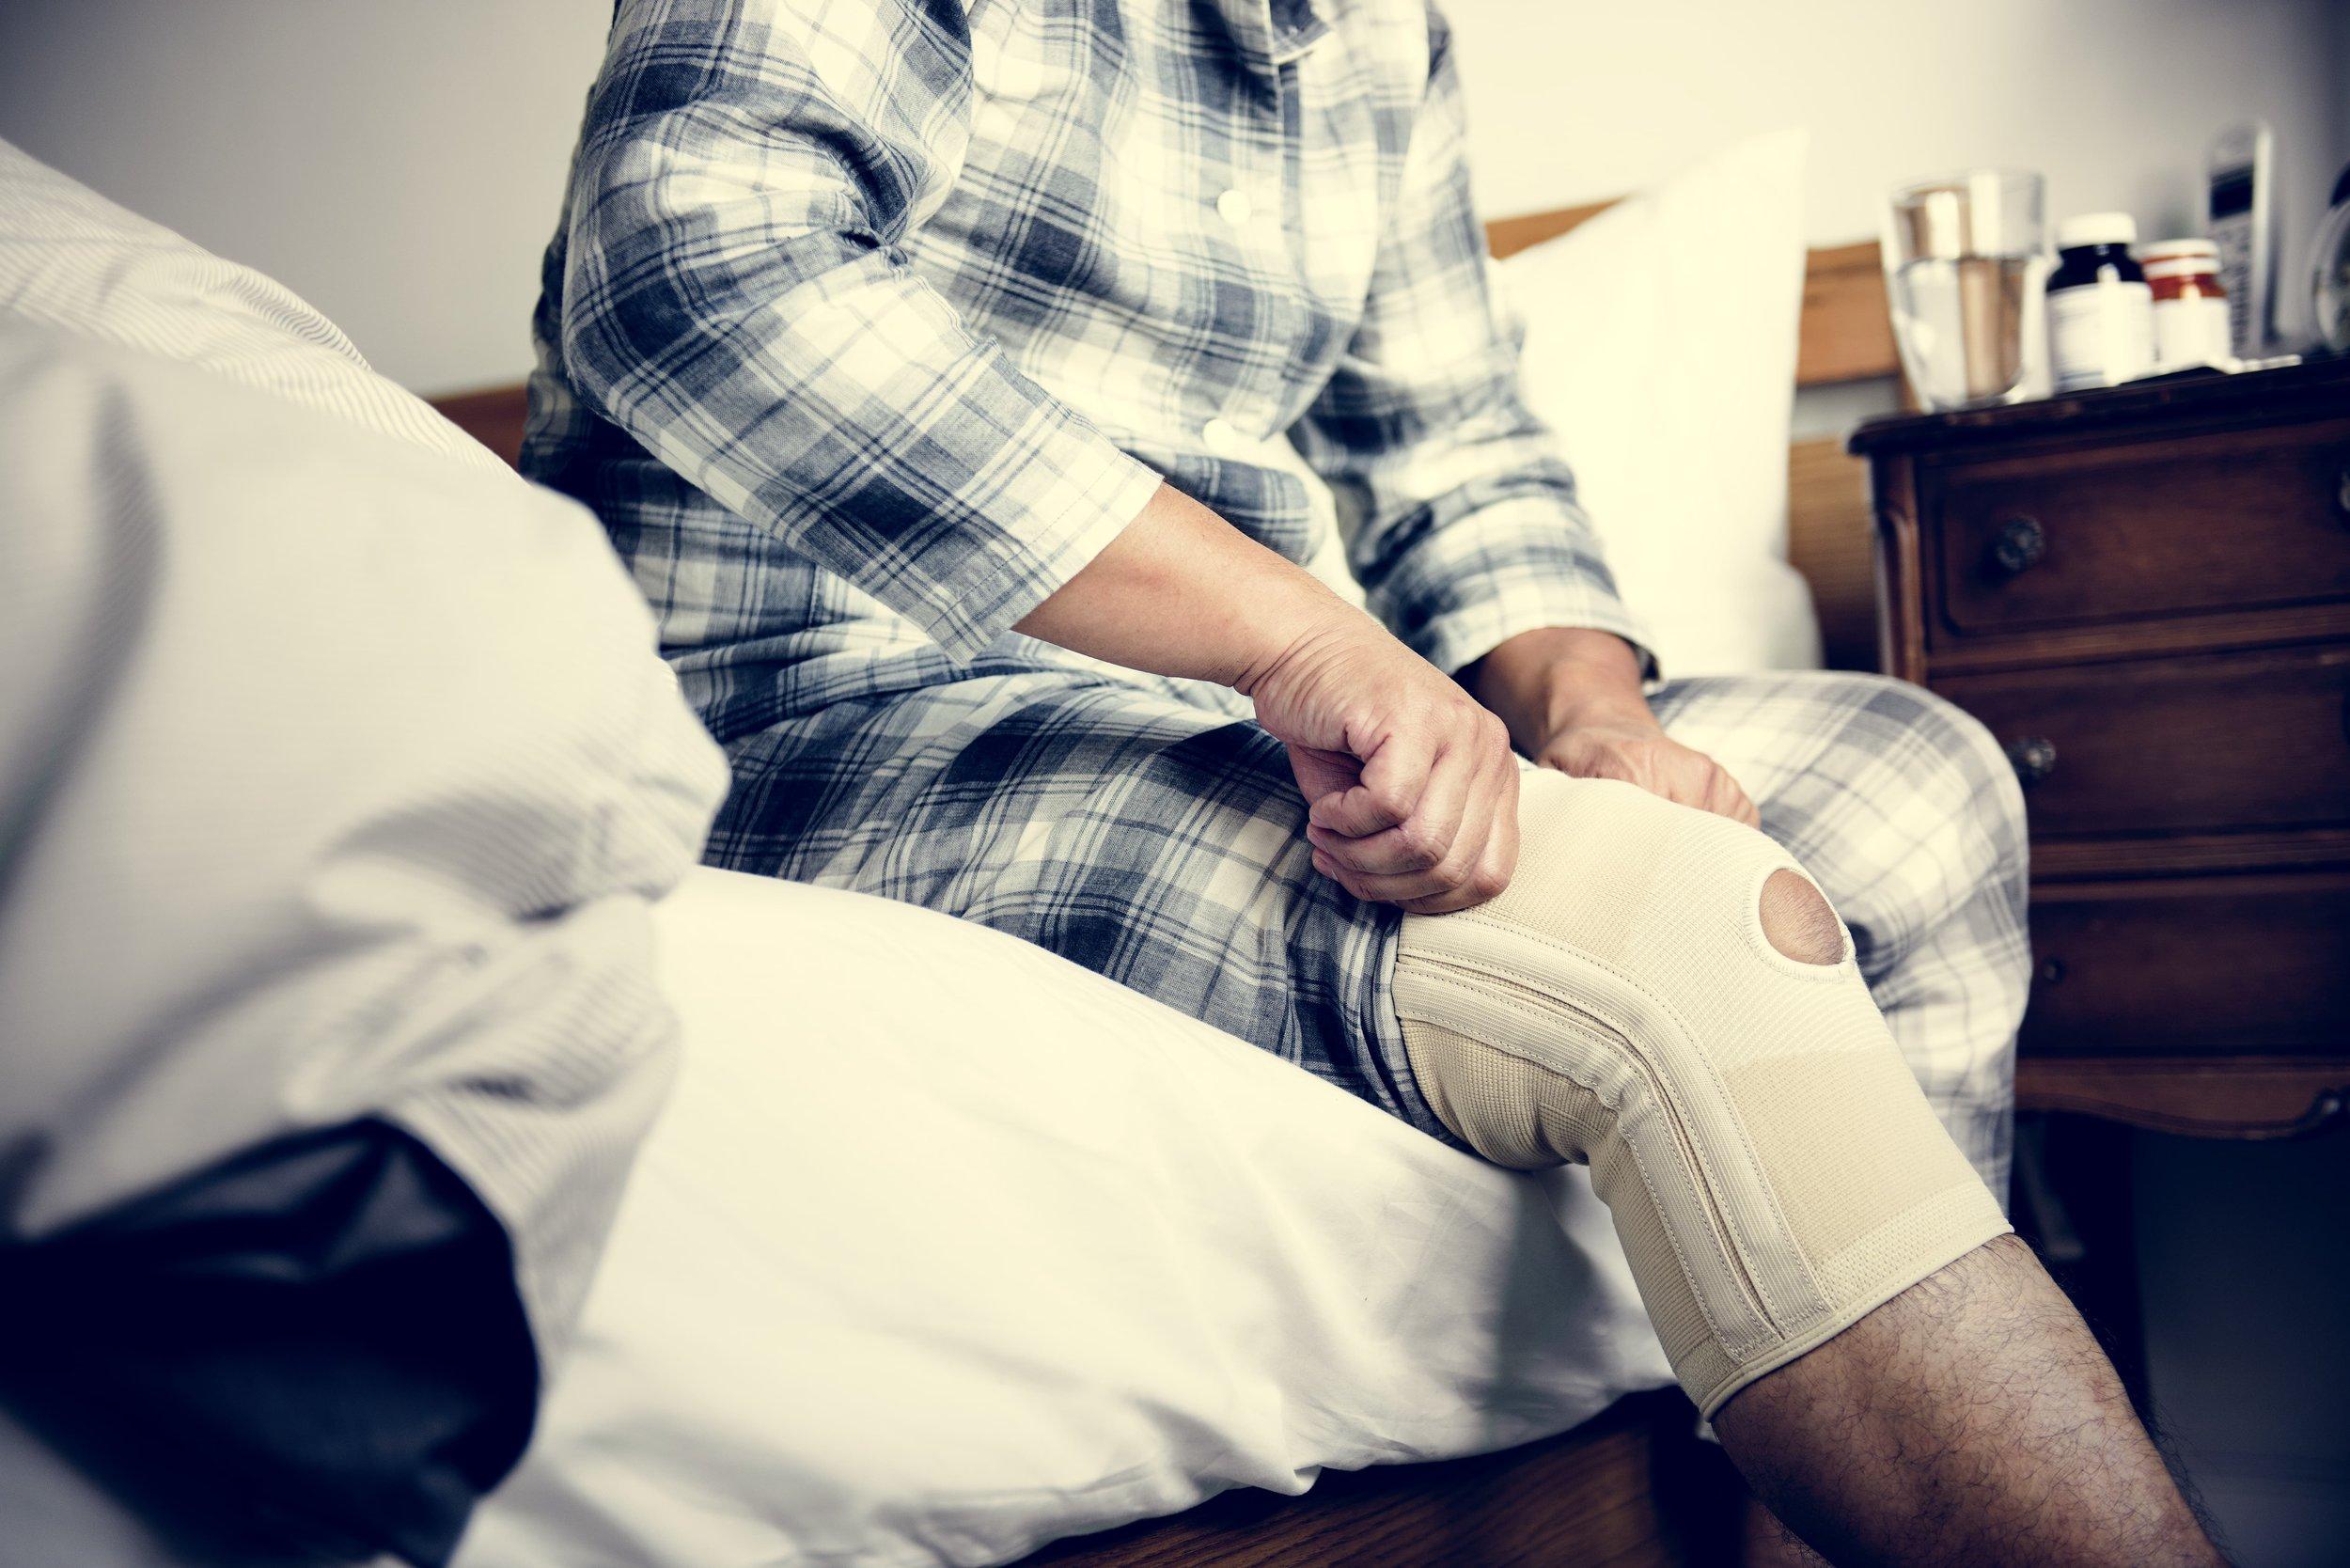 man-with-knee-injury